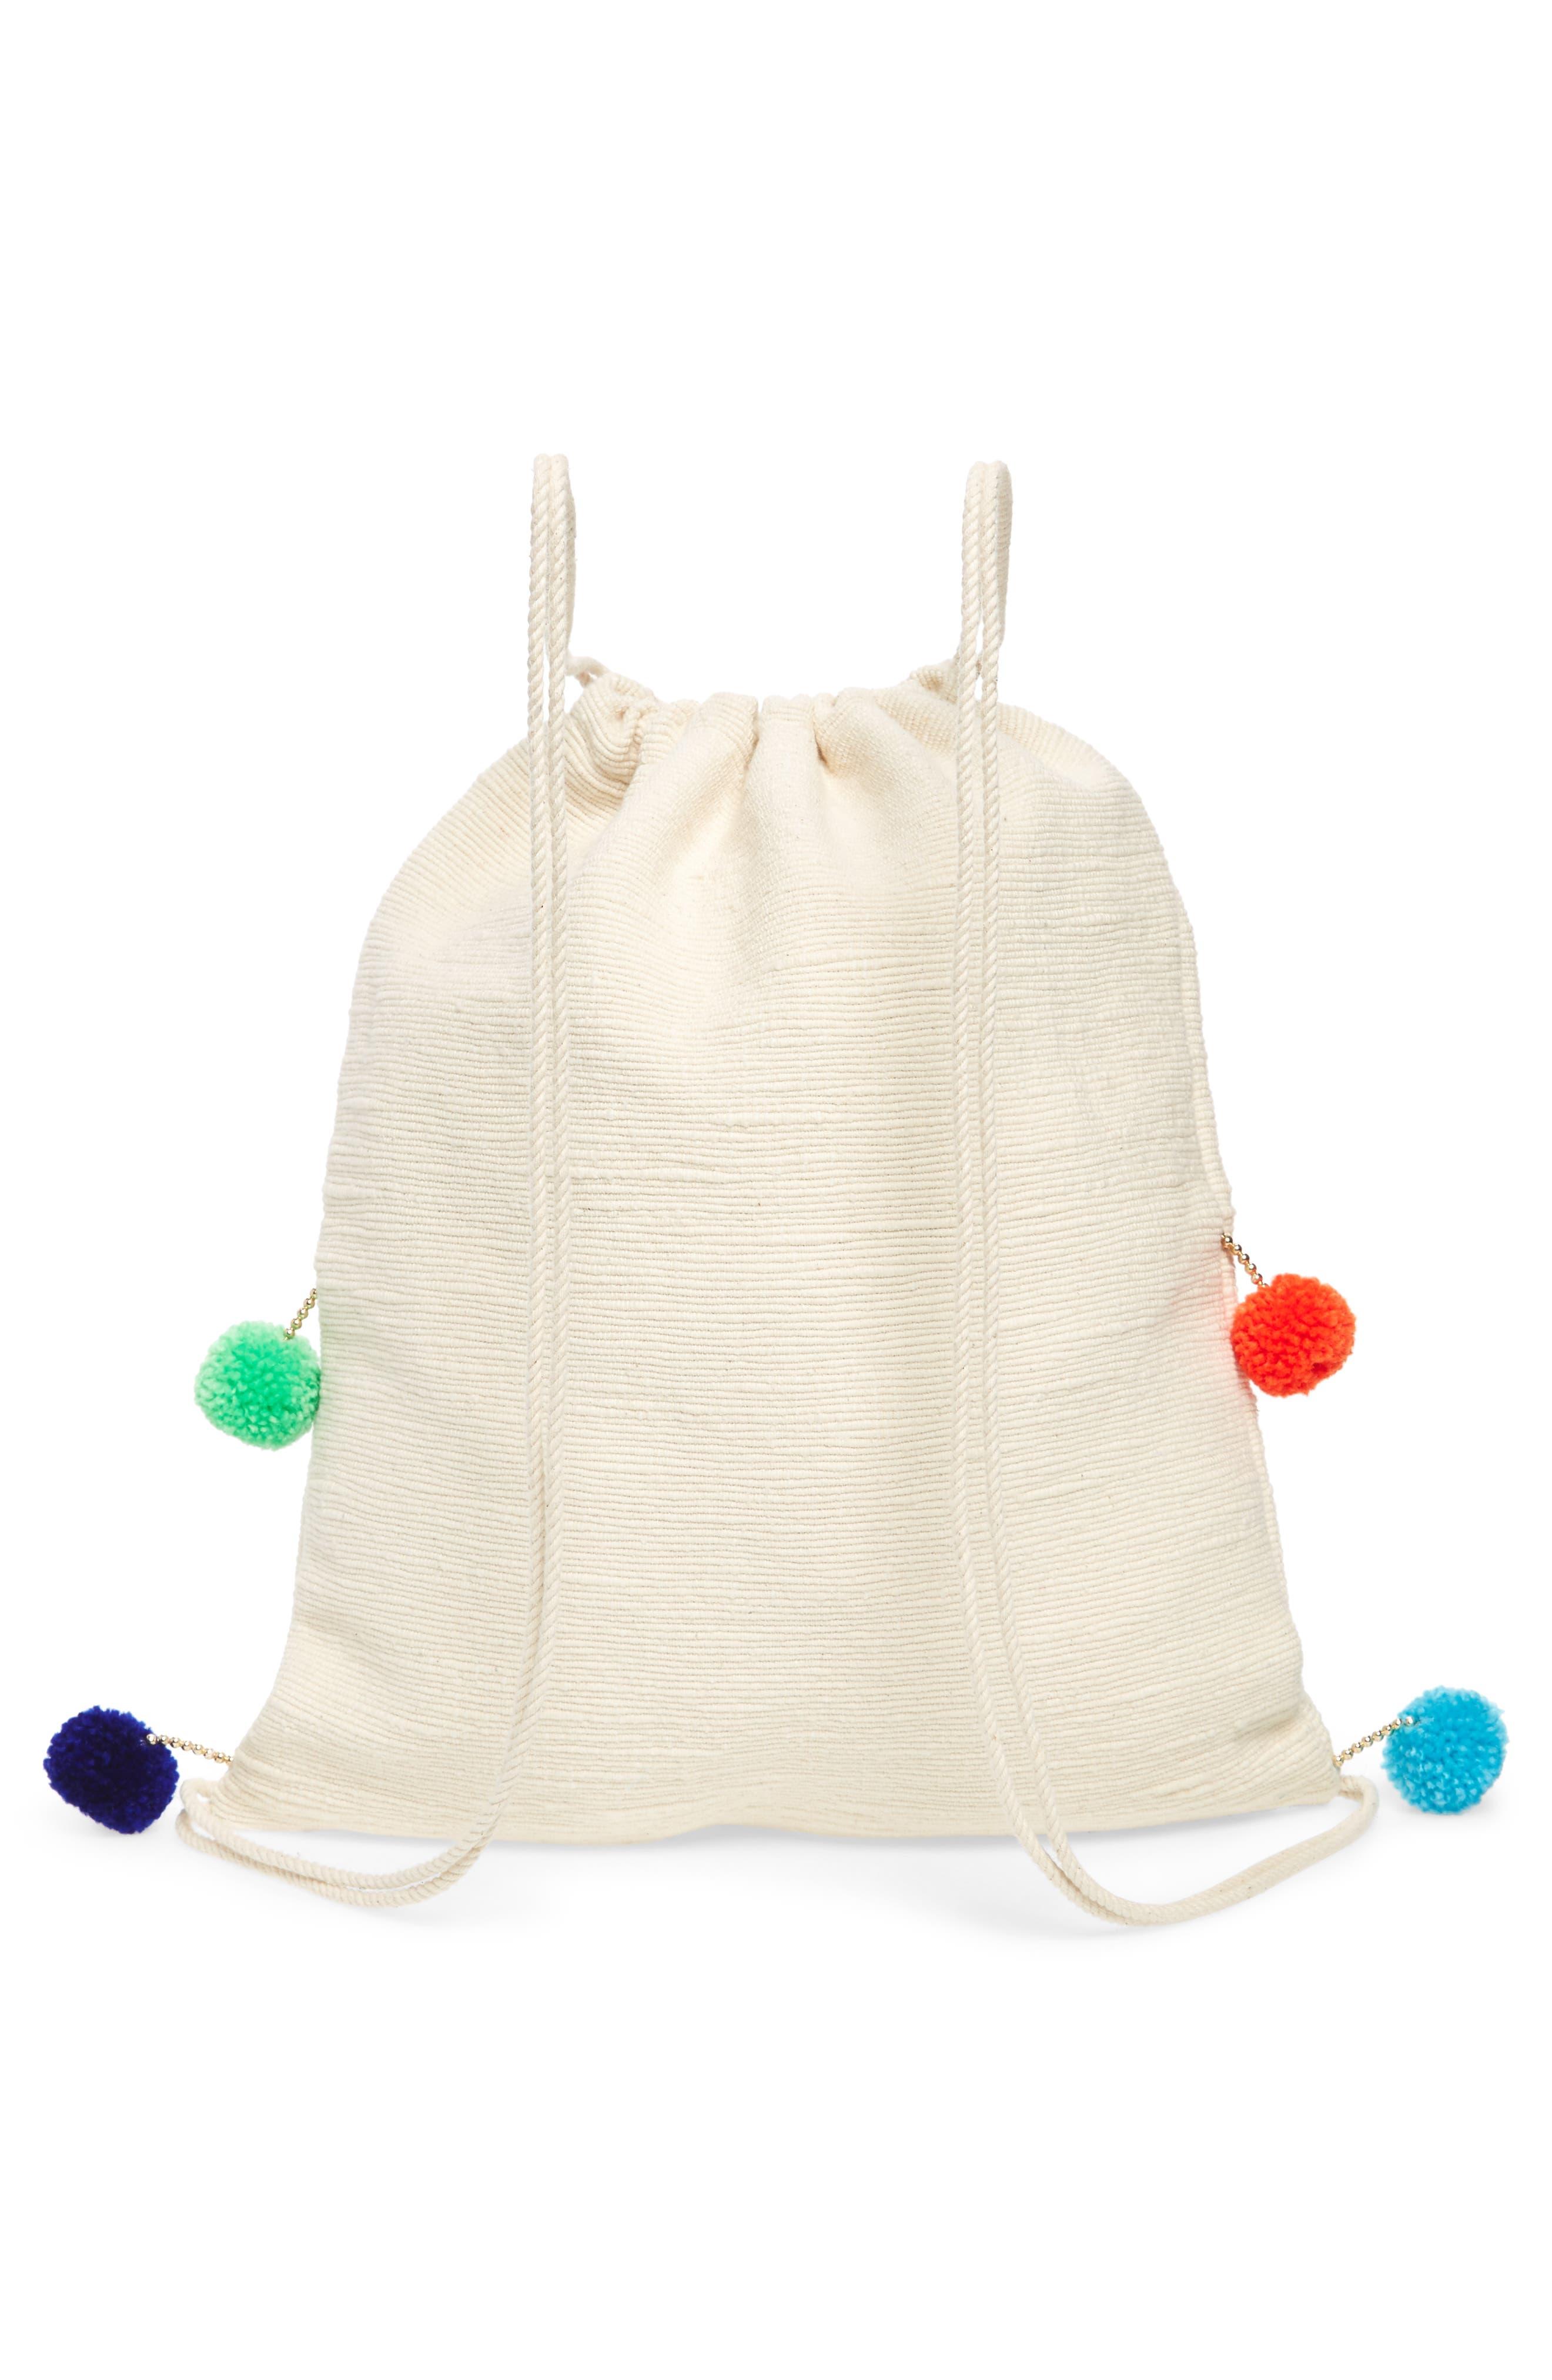 Pompom Drawstring Bag,                             Alternate thumbnail 3, color,                             Caramel